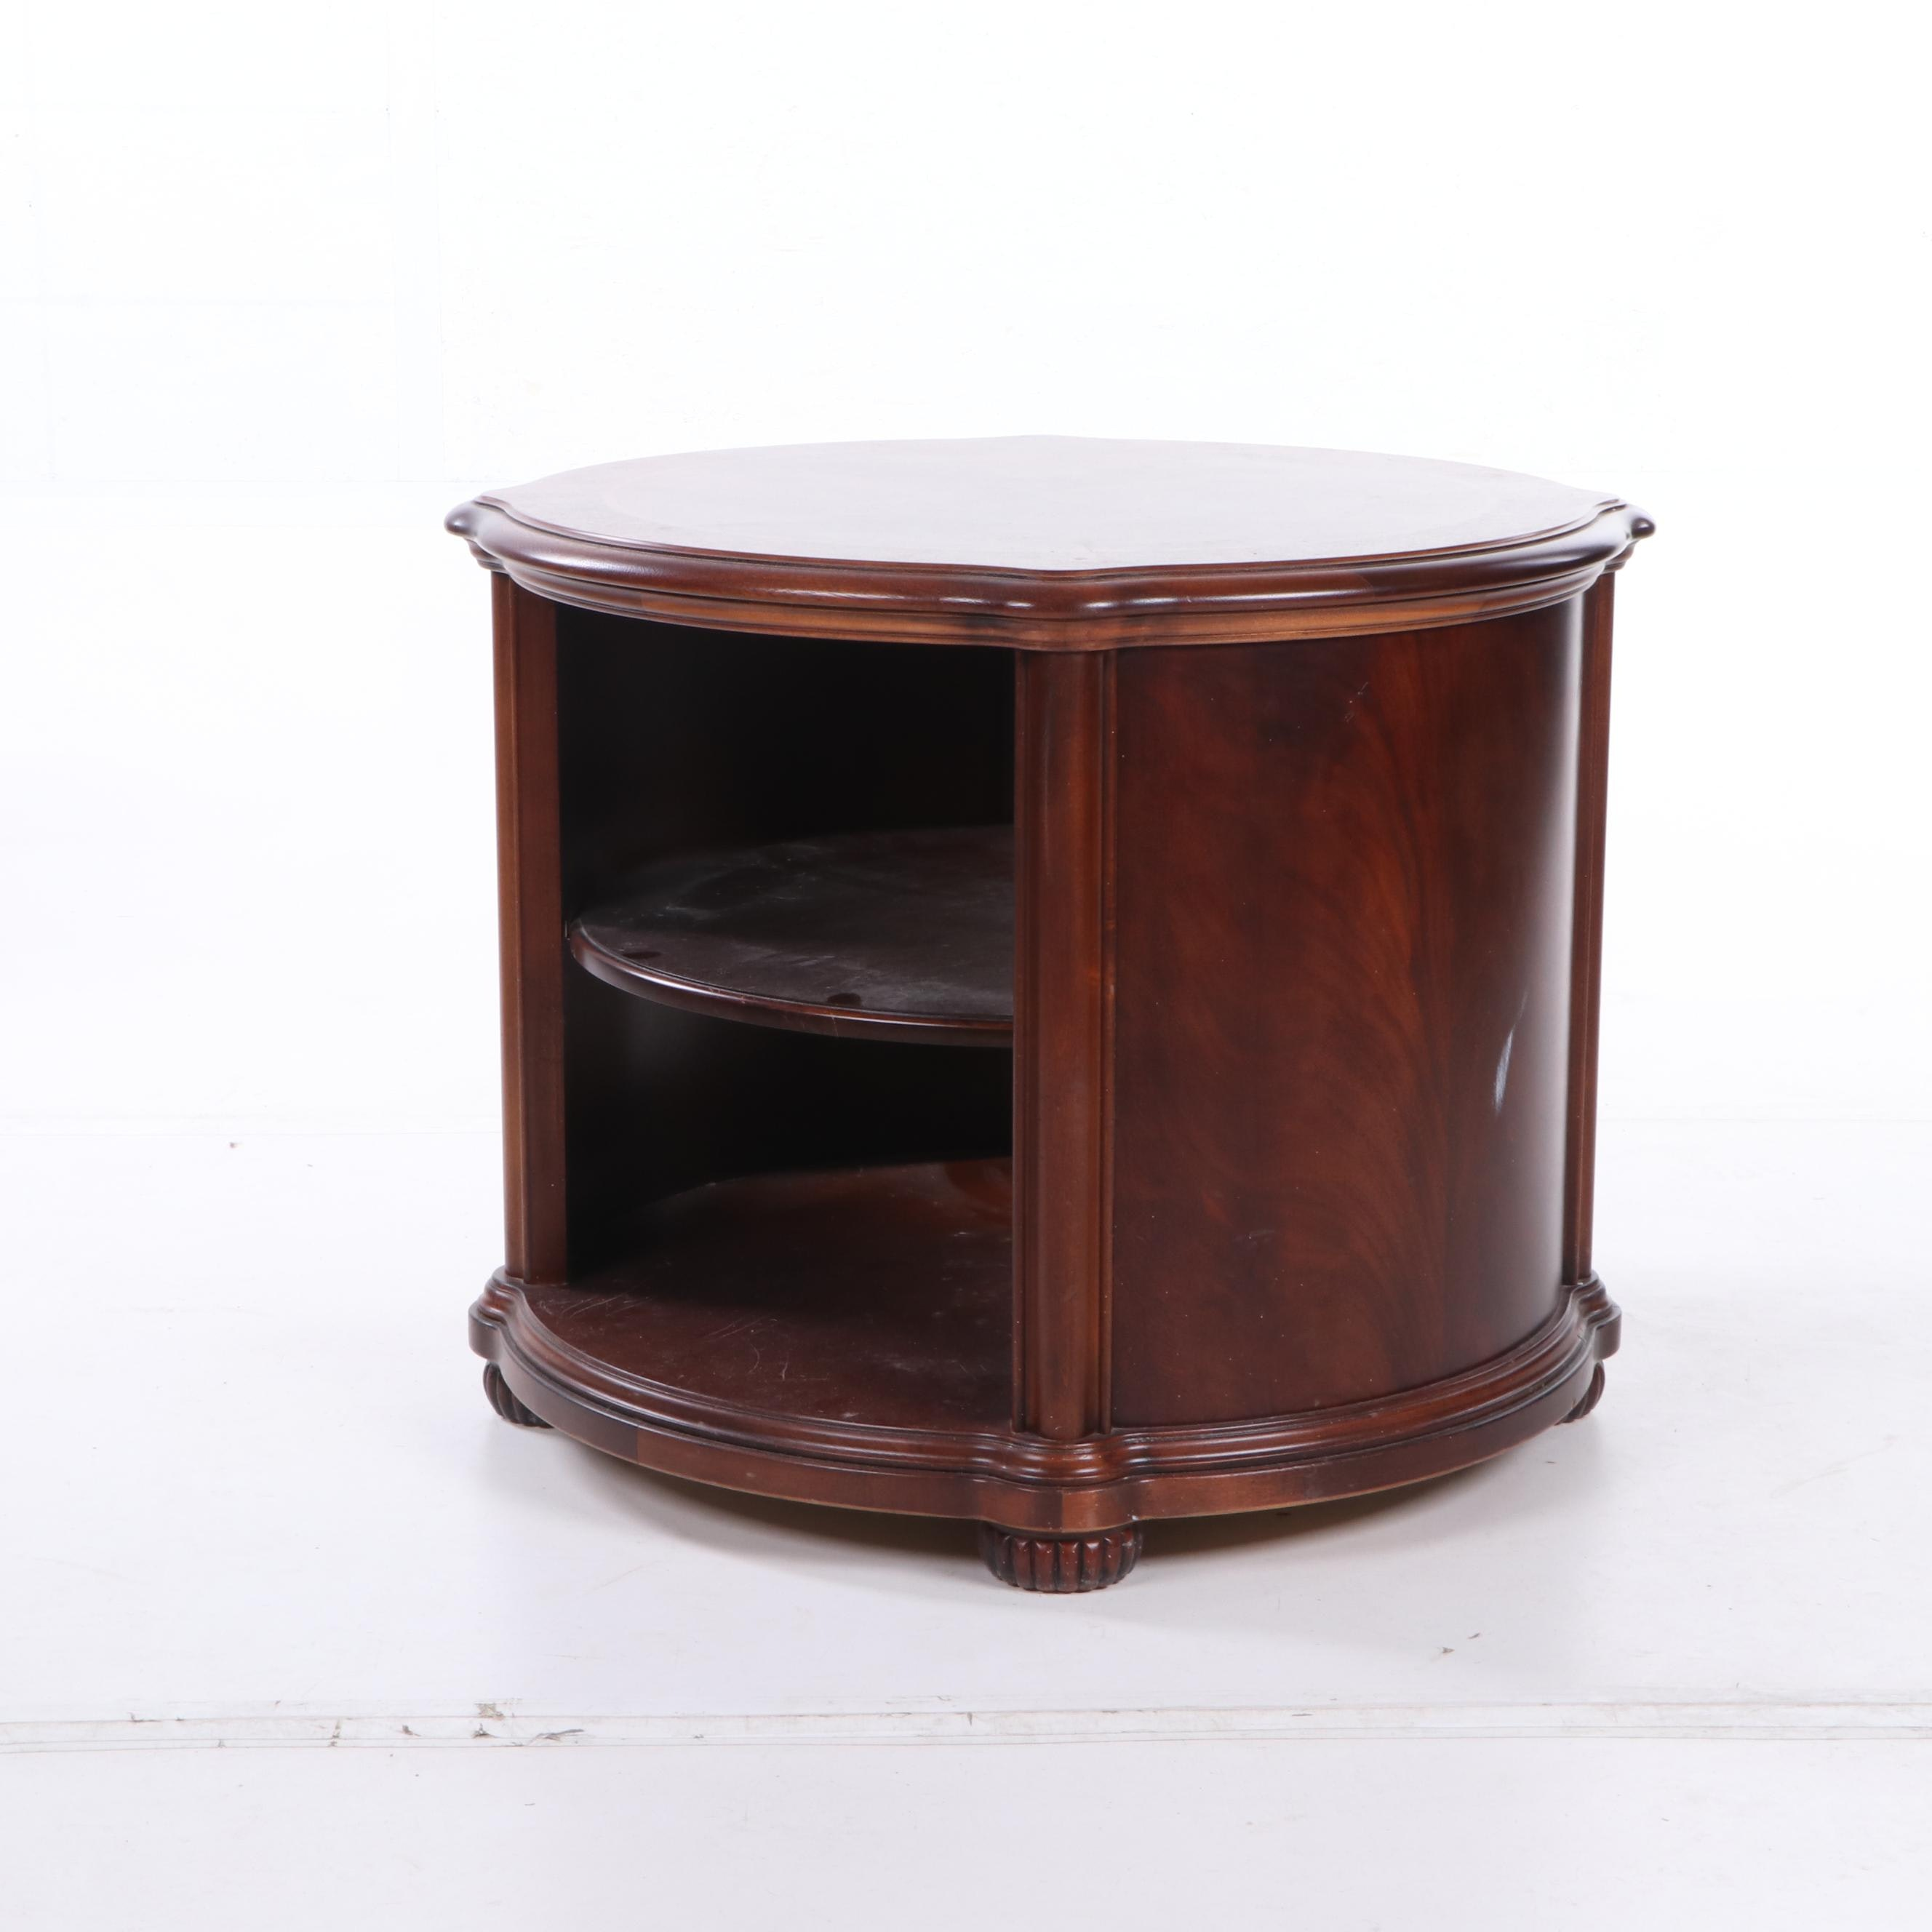 Round Figured Mahagany Side Table, 20th Century